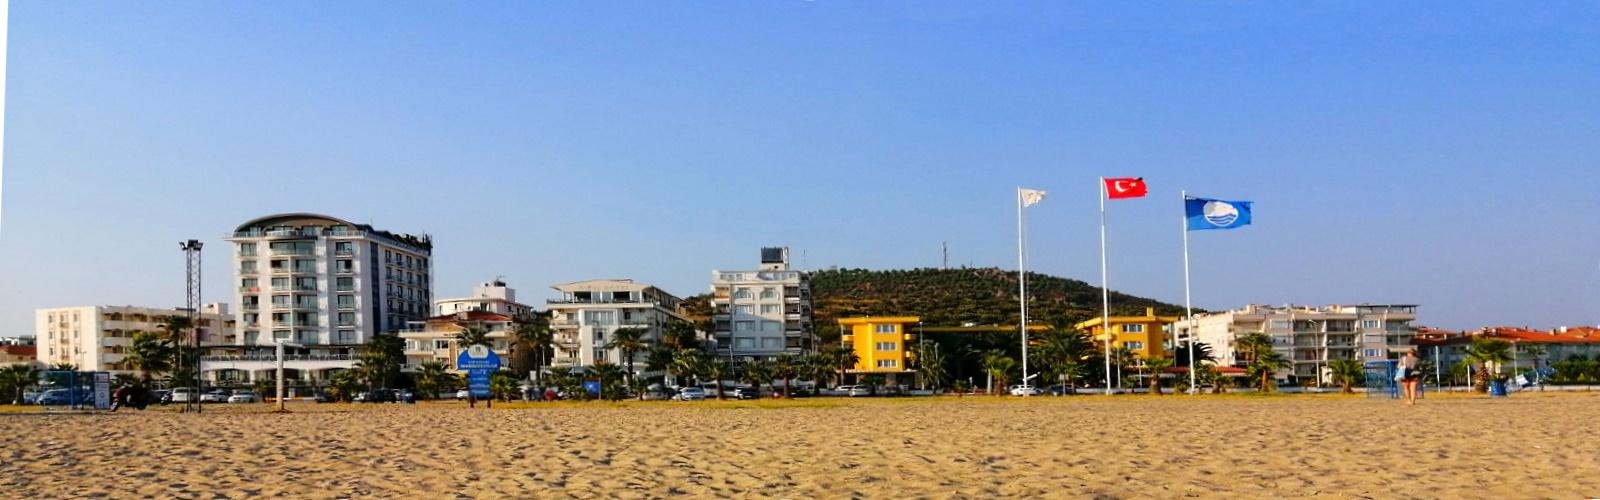 Azur Travel